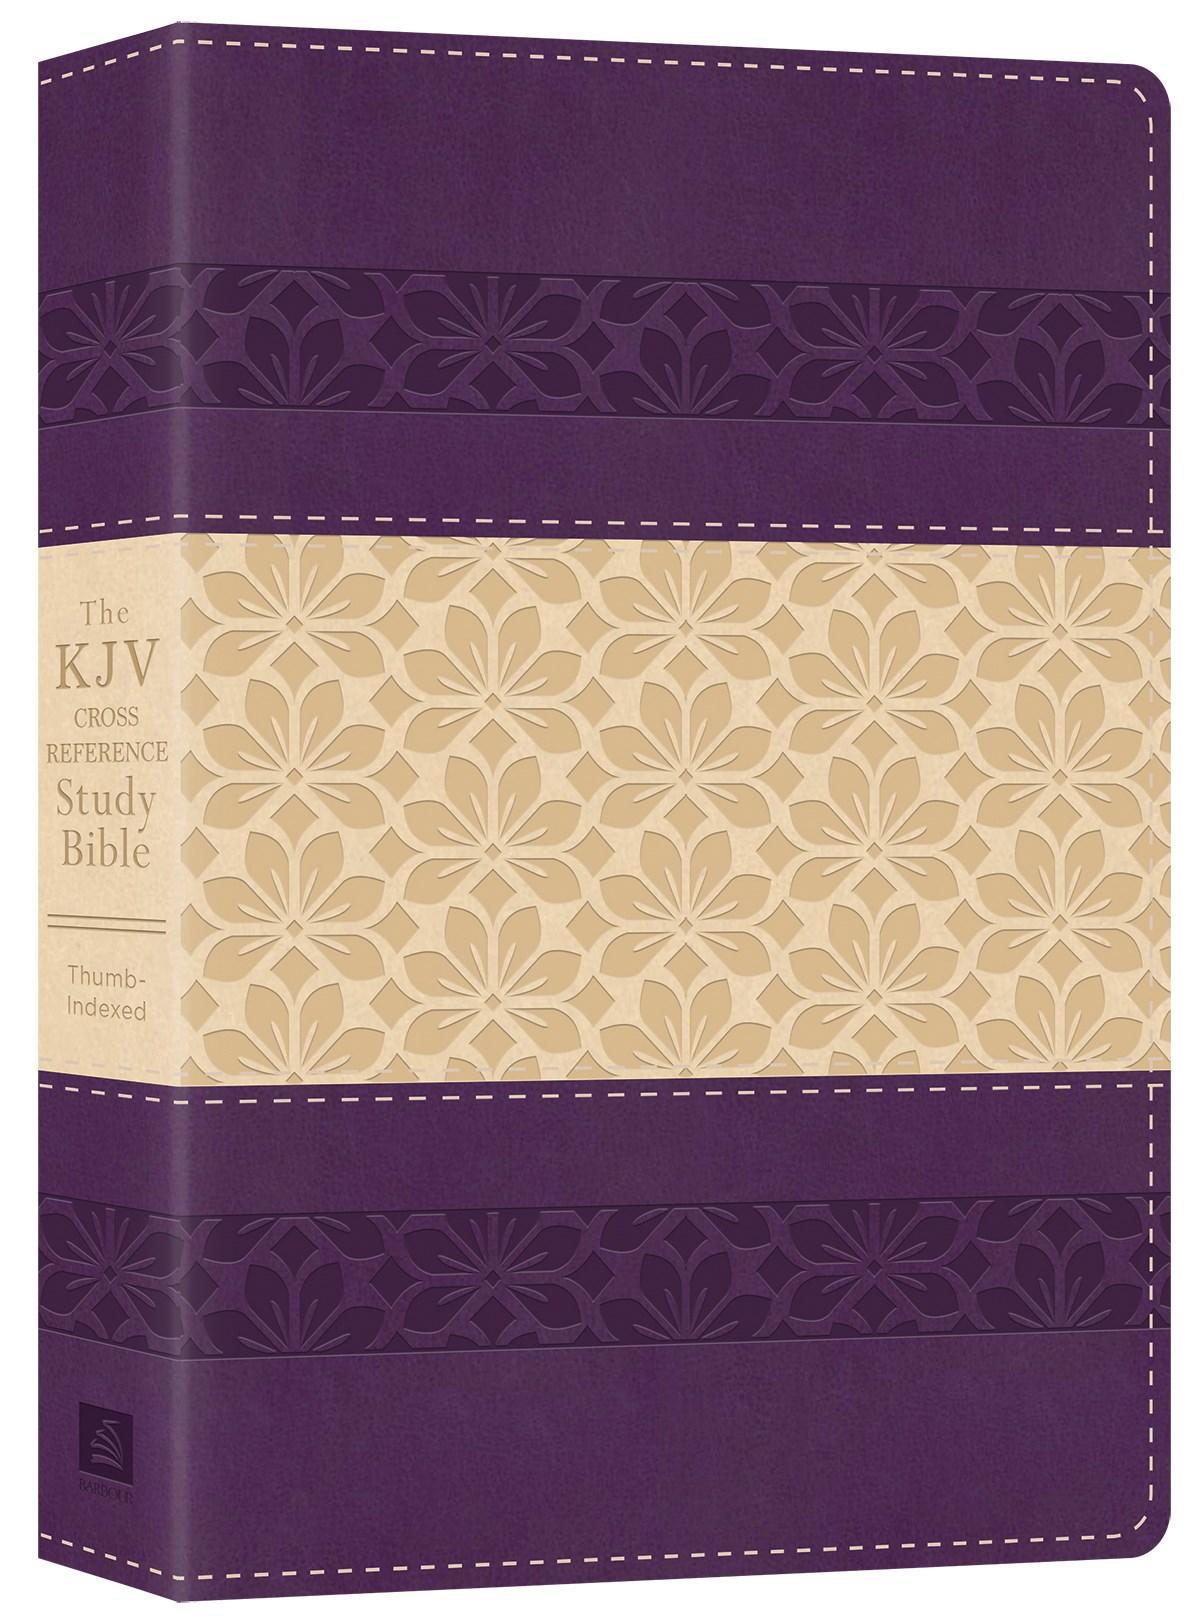 KJV Cross Reference Study Bible-Purple/Rose DiCarta Indexed